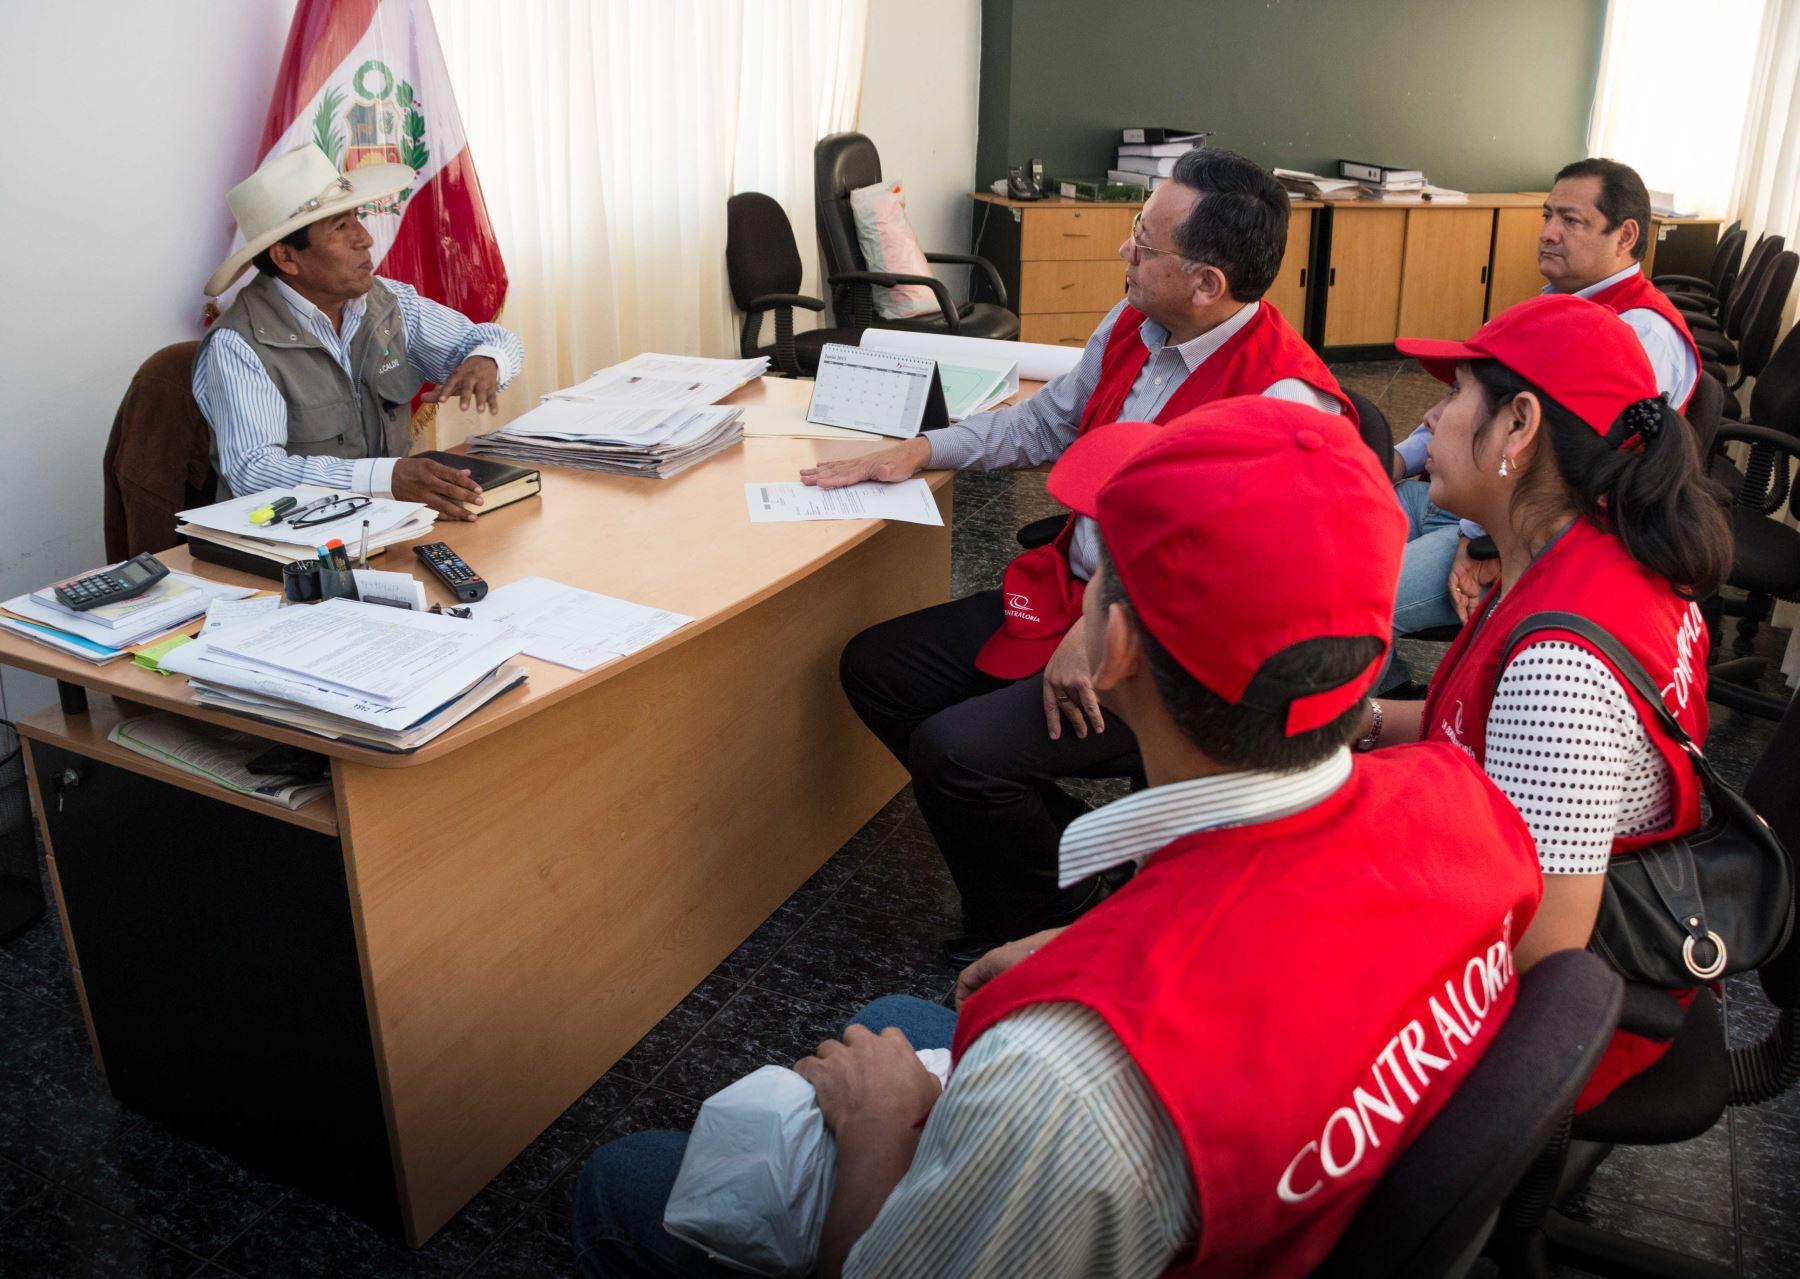 Contraloría identifica indicios de corrupción en municipalidades de Islay. (Foto: Andina)